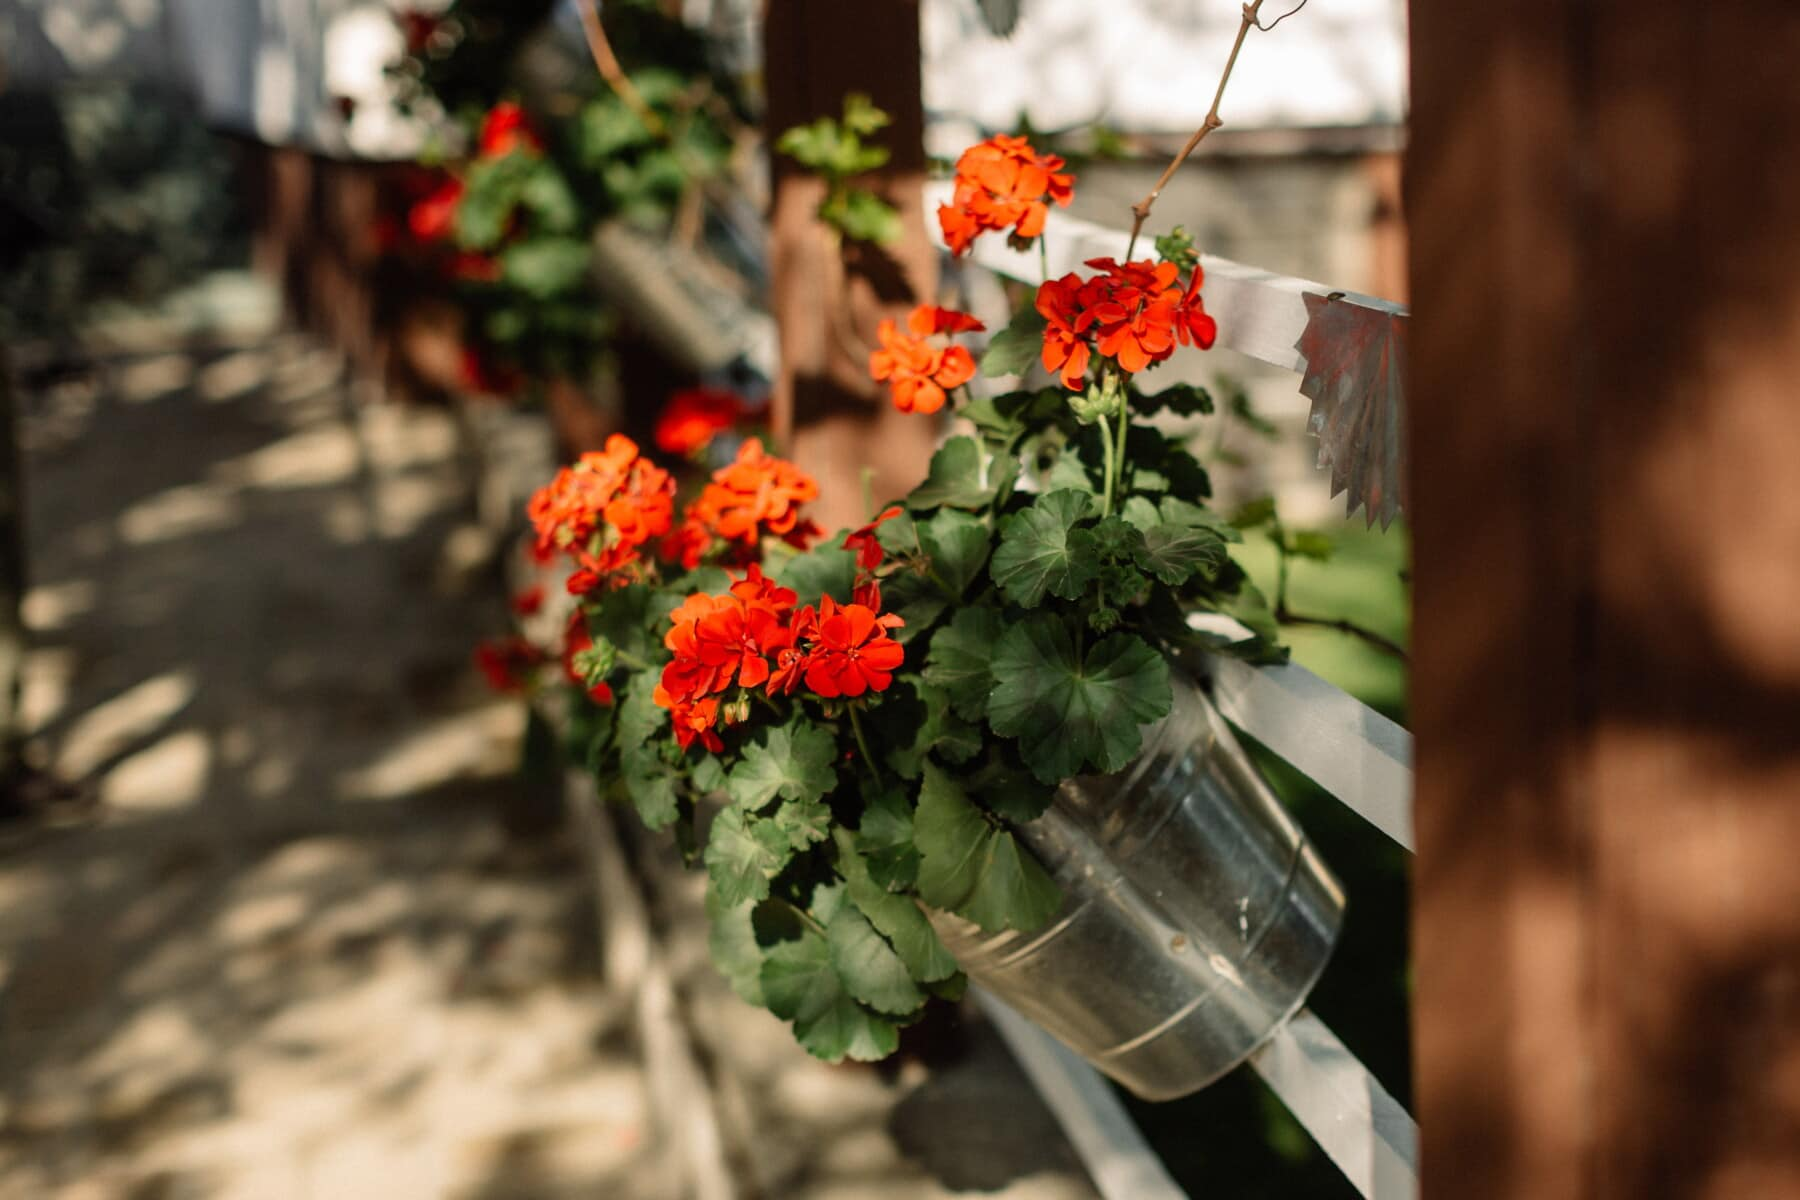 Geranie, Blumentopf, Eimer, Metall, Jahrgang, Lattenzaun, Blume, Anlage, Natur, Blatt